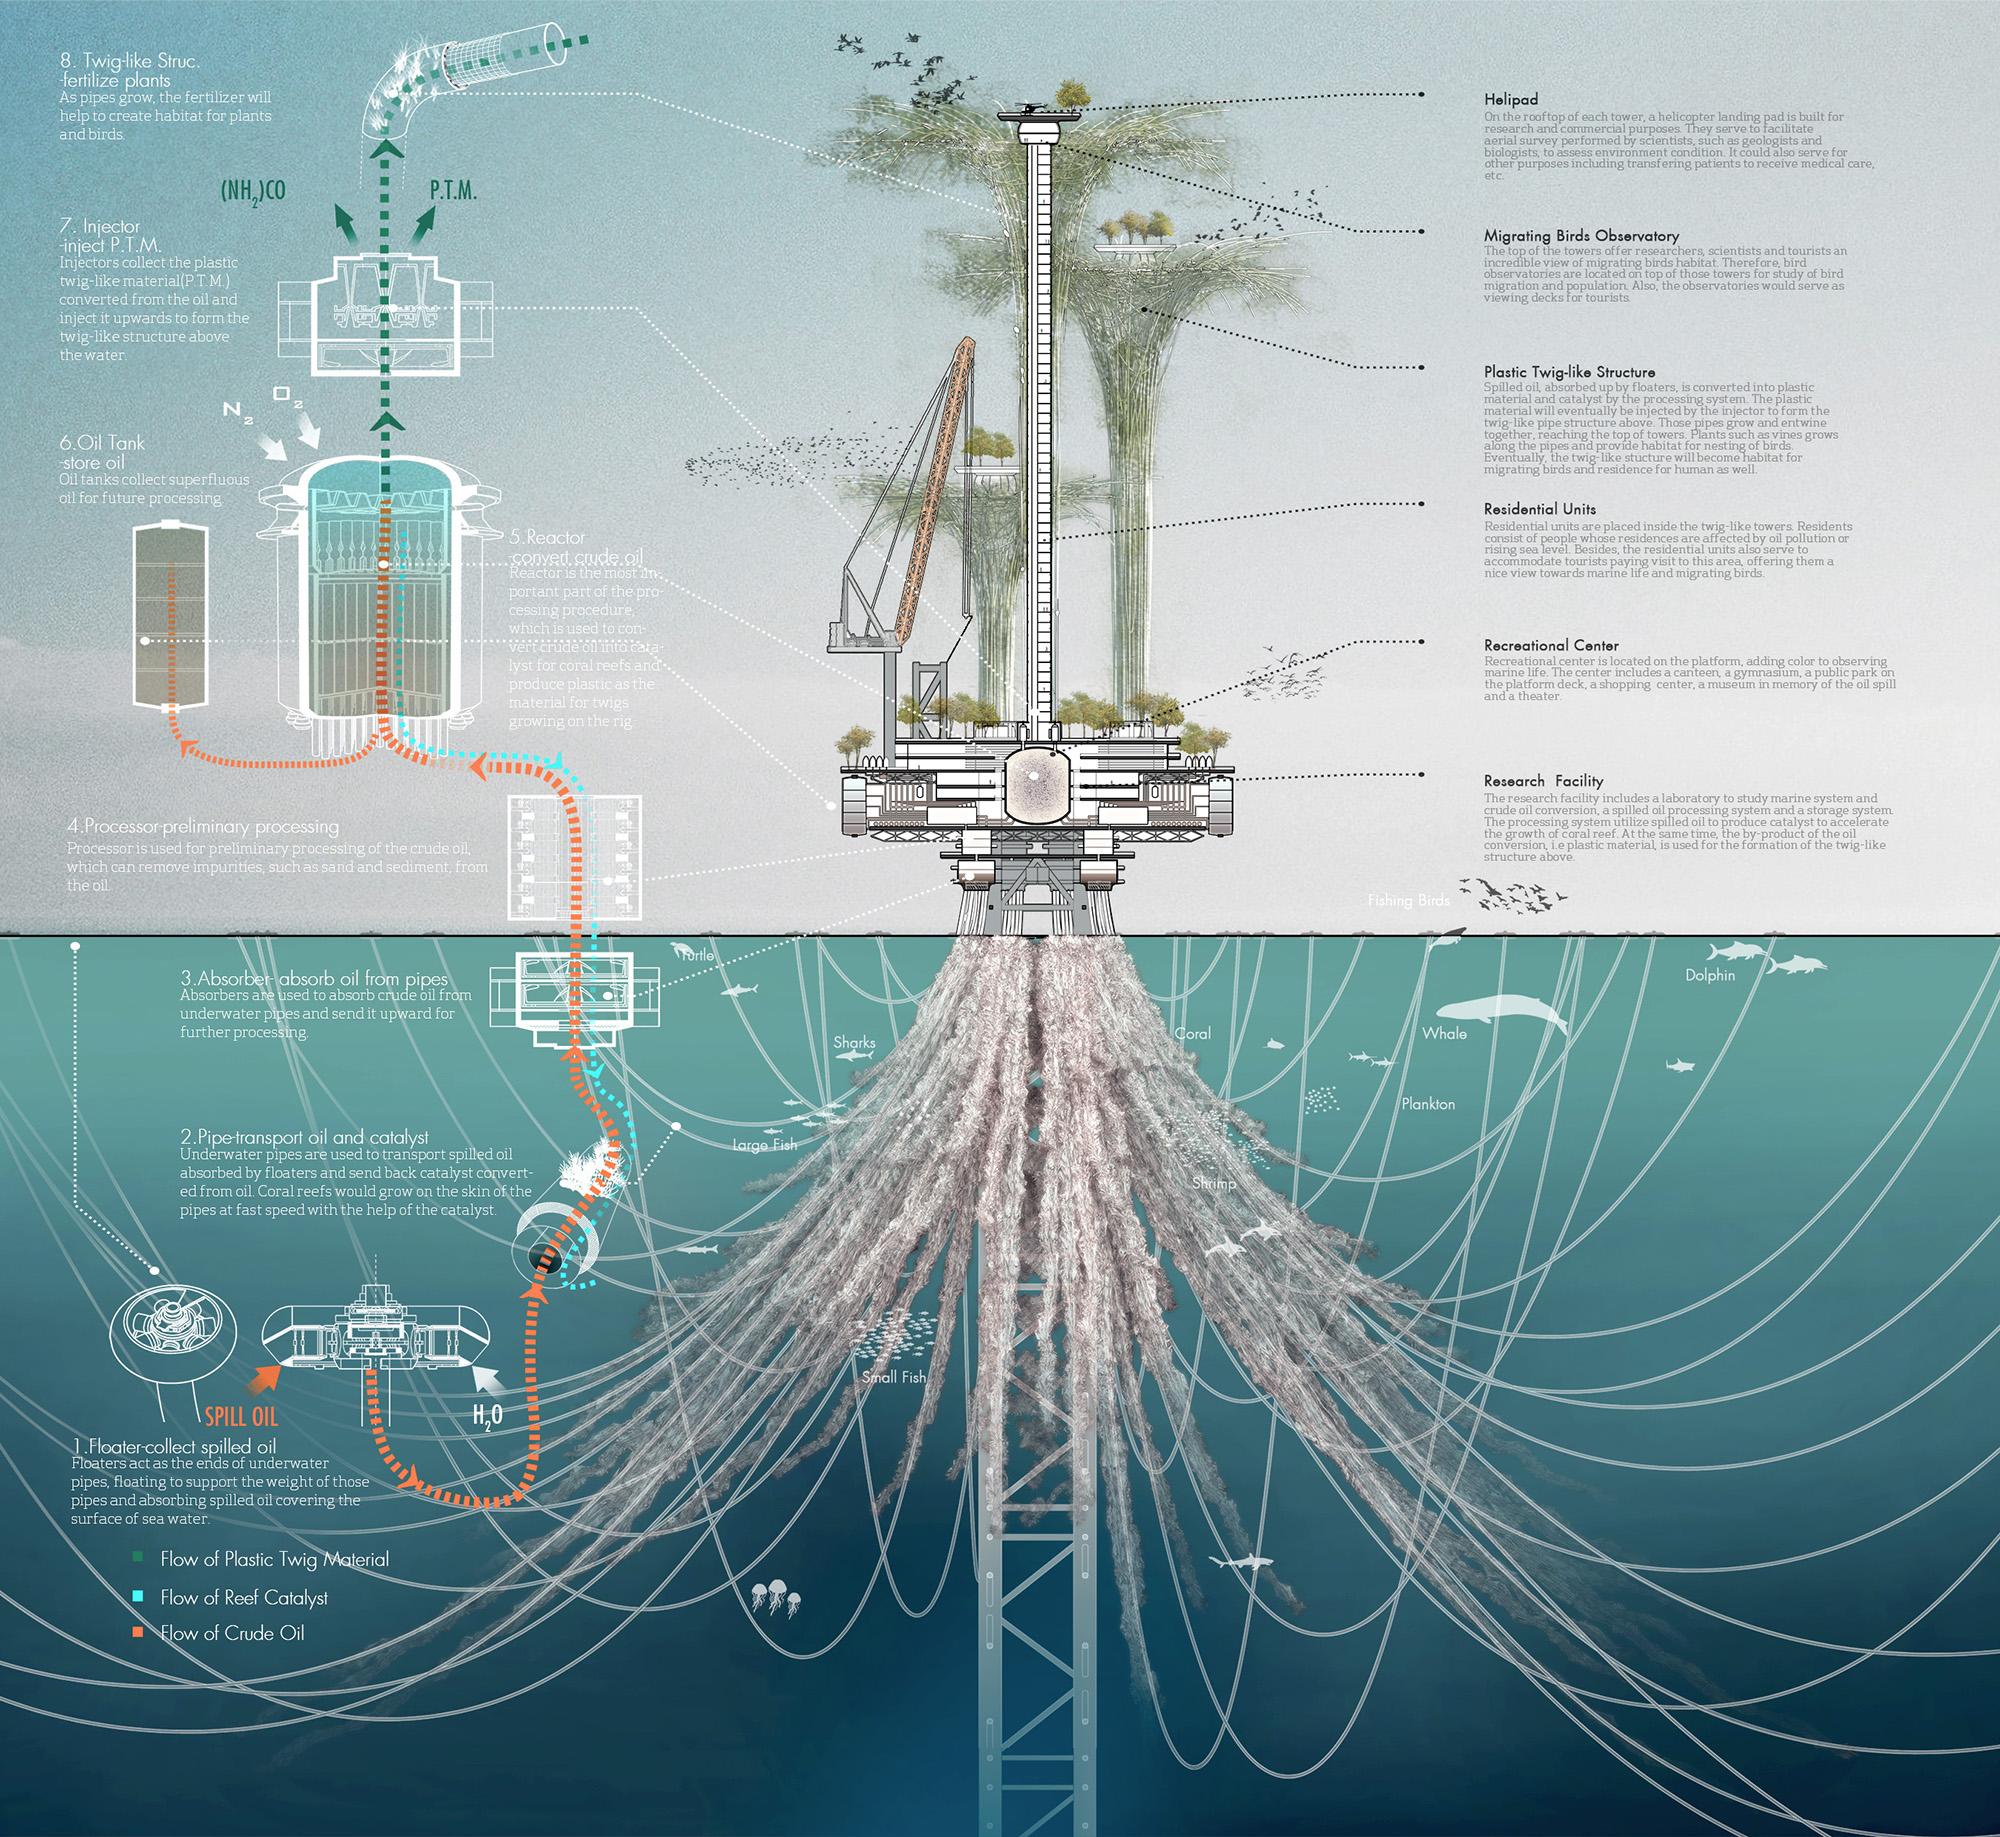 Noah Oasis:Rig to Vertical Bio-habitat